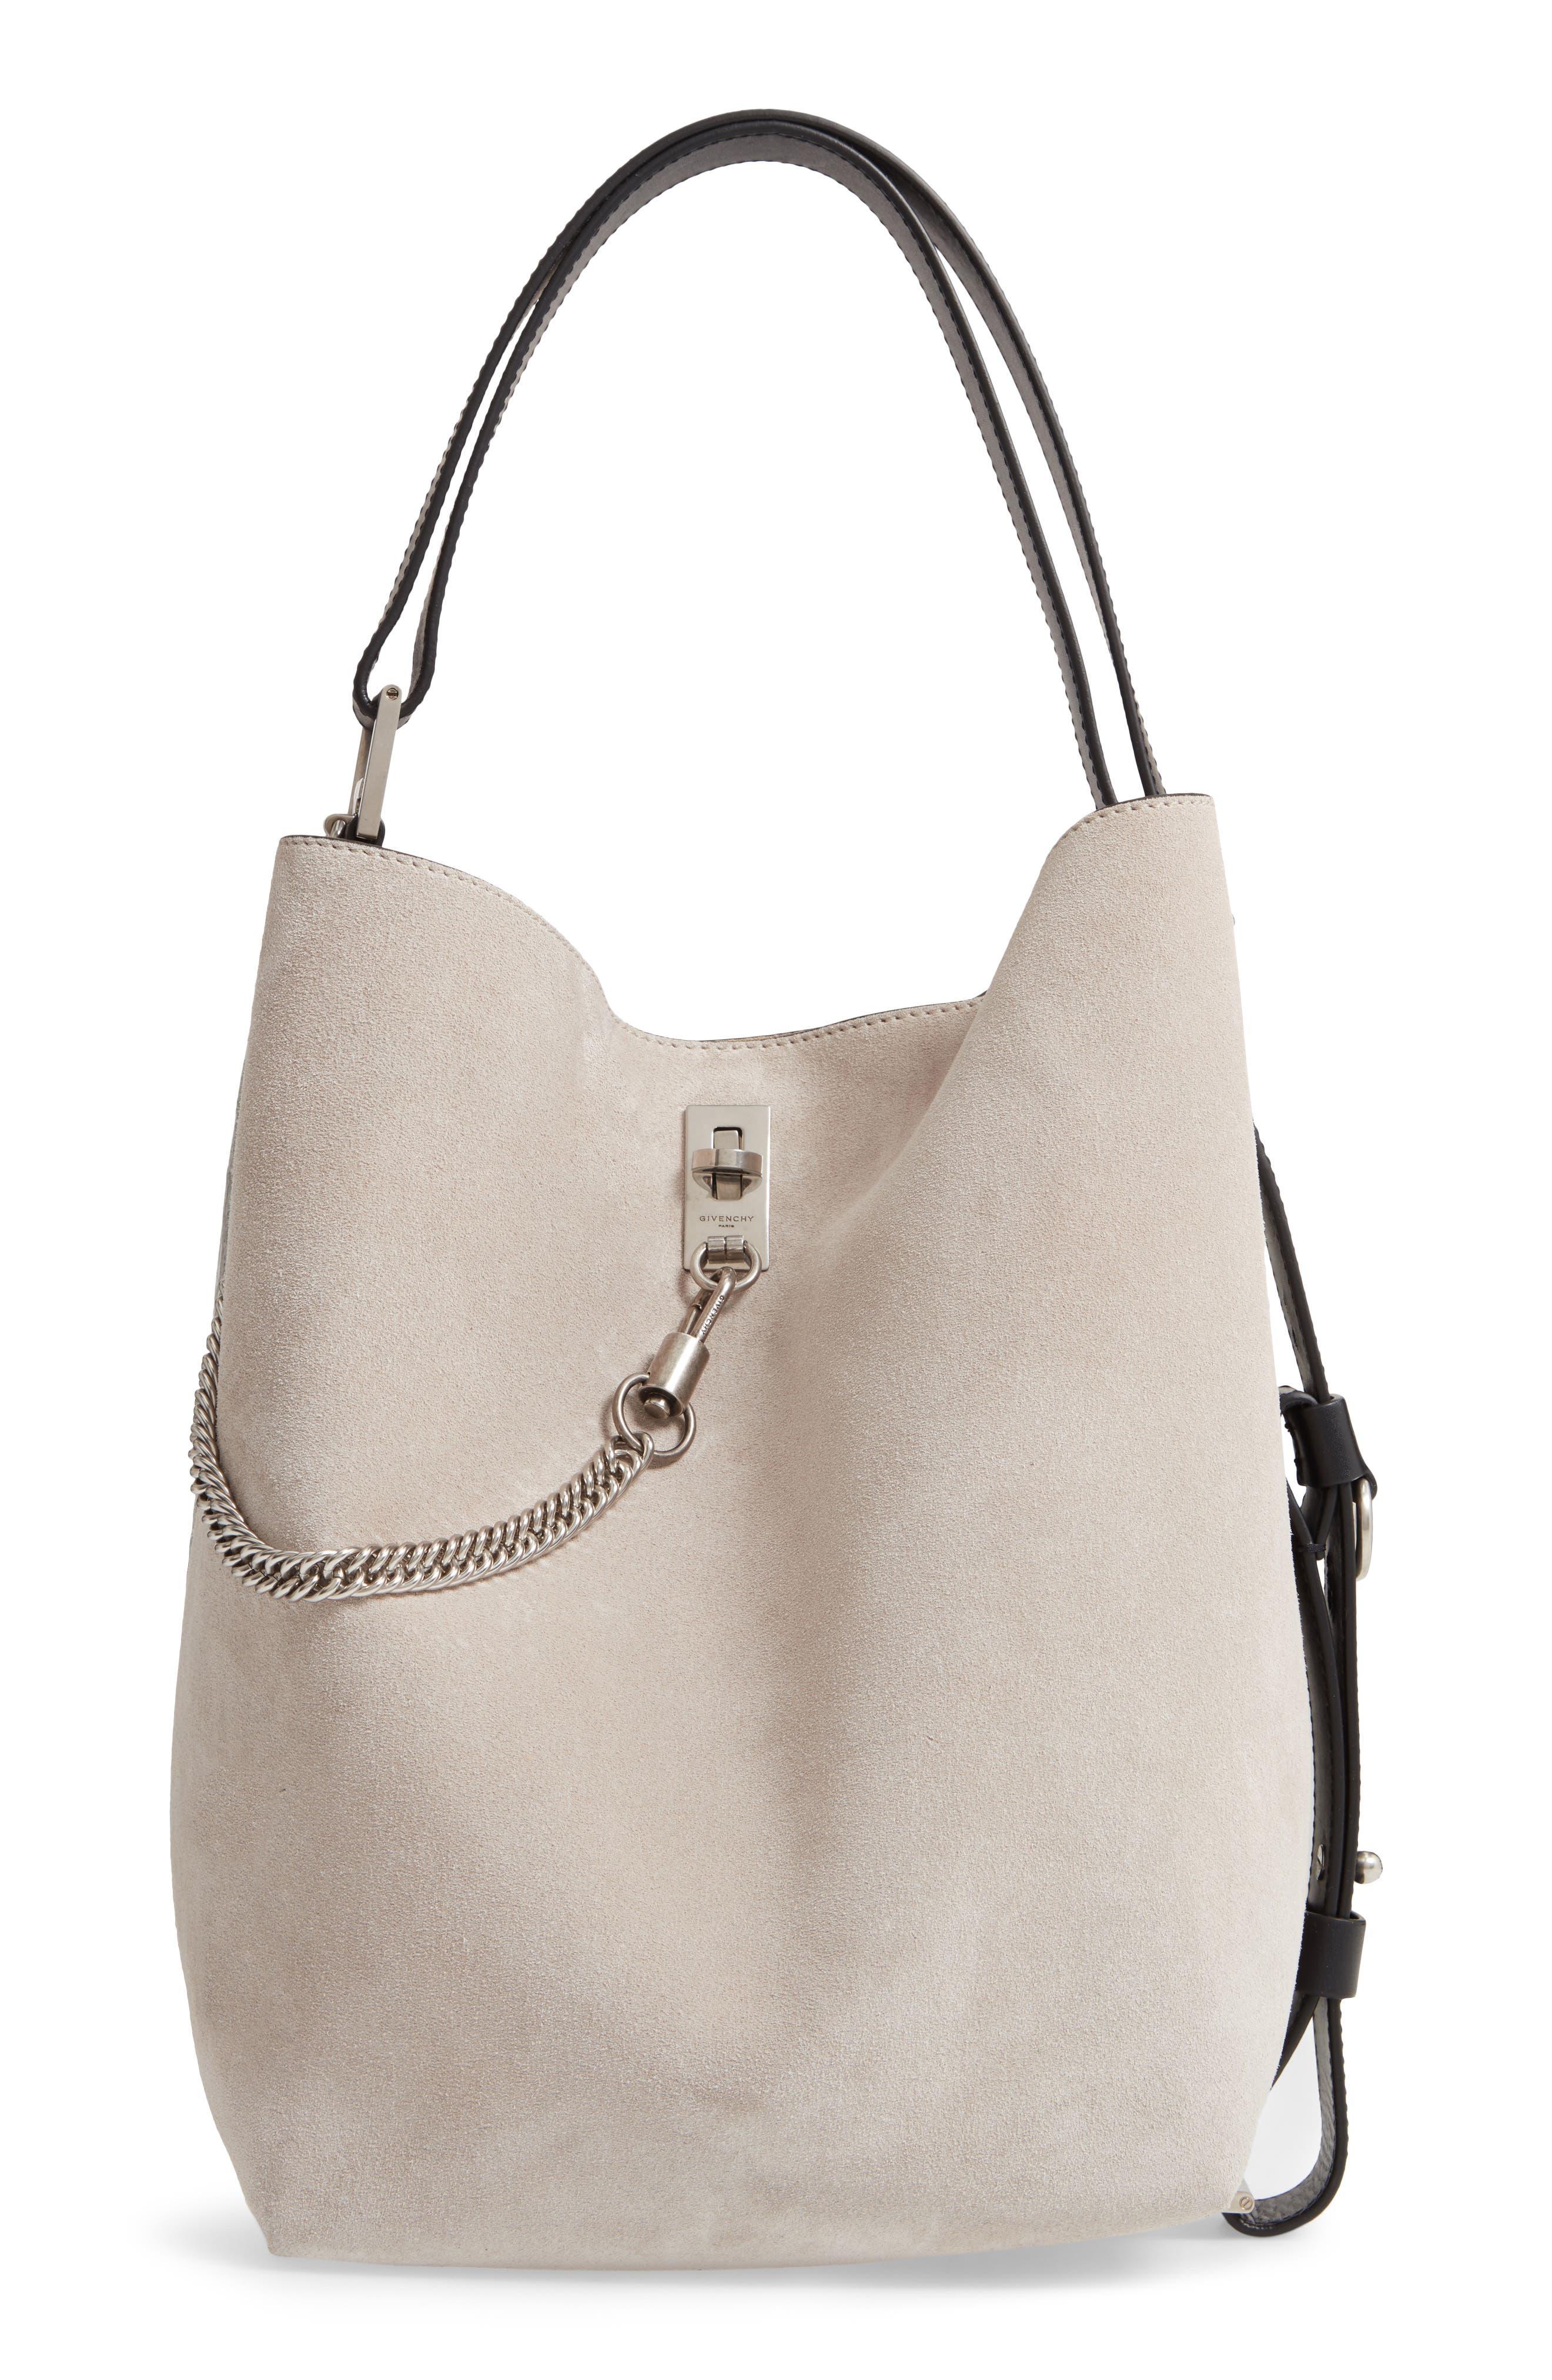 Medium GV Calfskin Suede Bucket Bag, Main, color, NATURAL/ SILVER